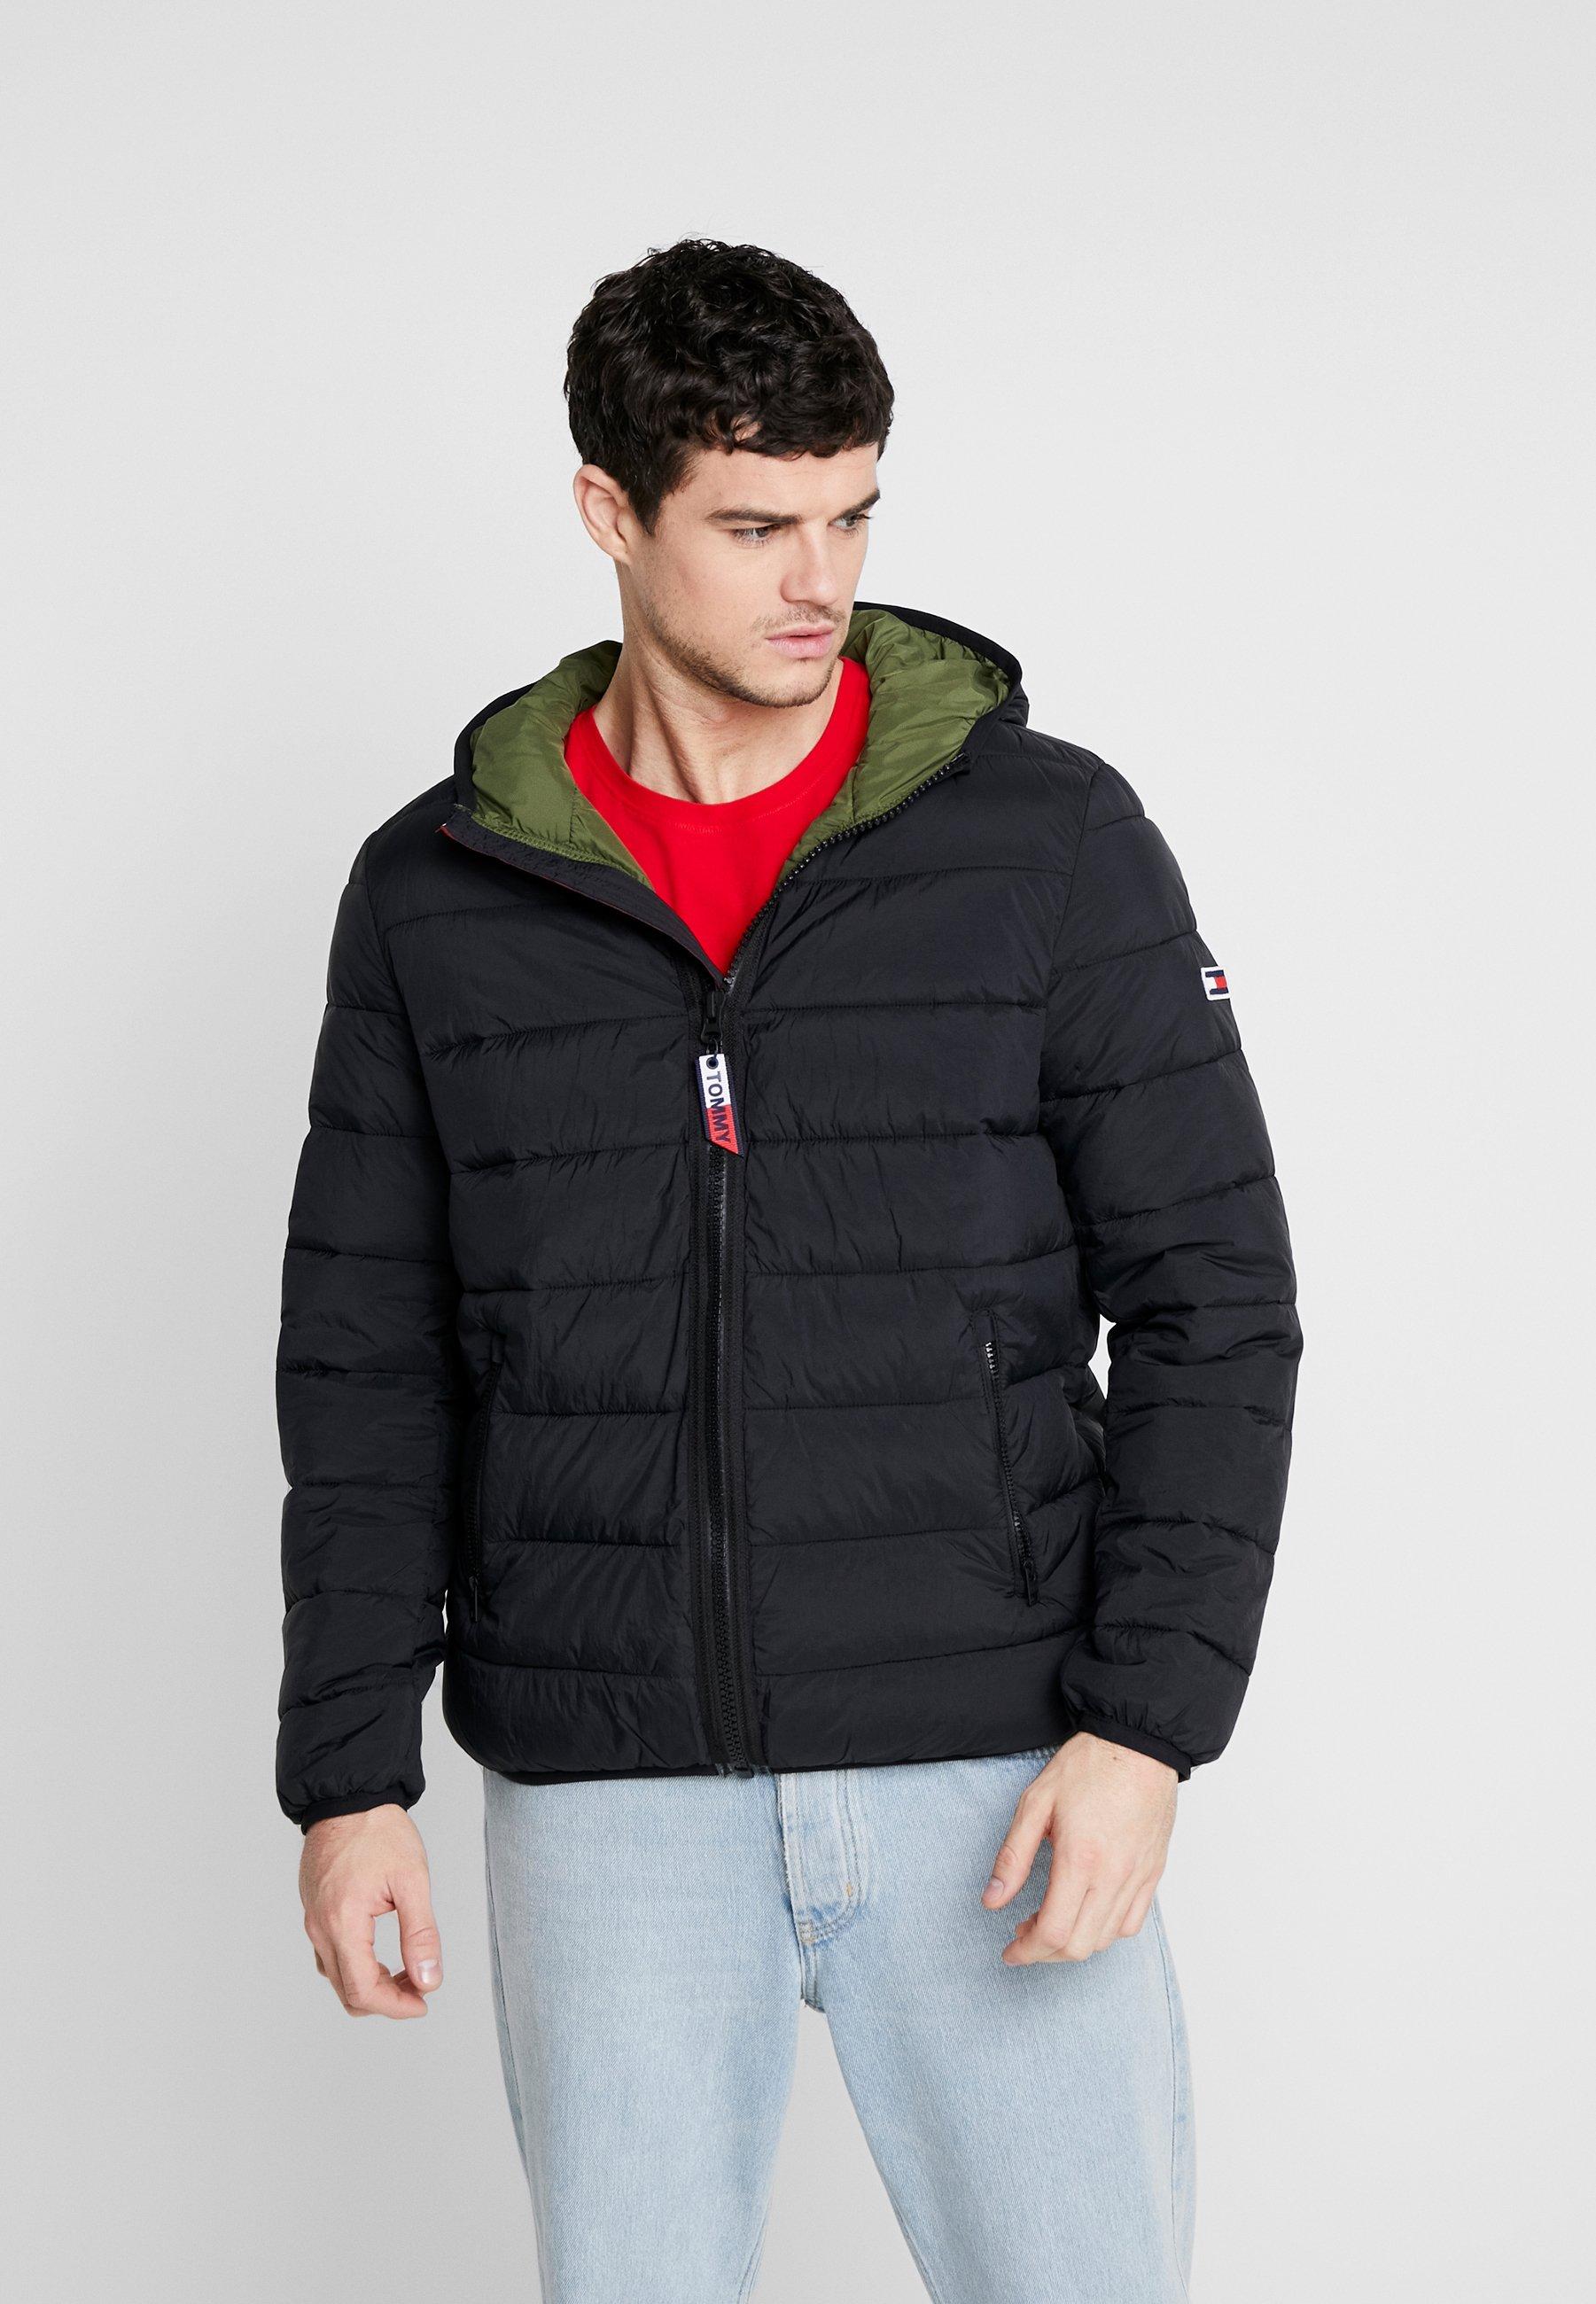 nike kurtka zimowa meska niepikowana